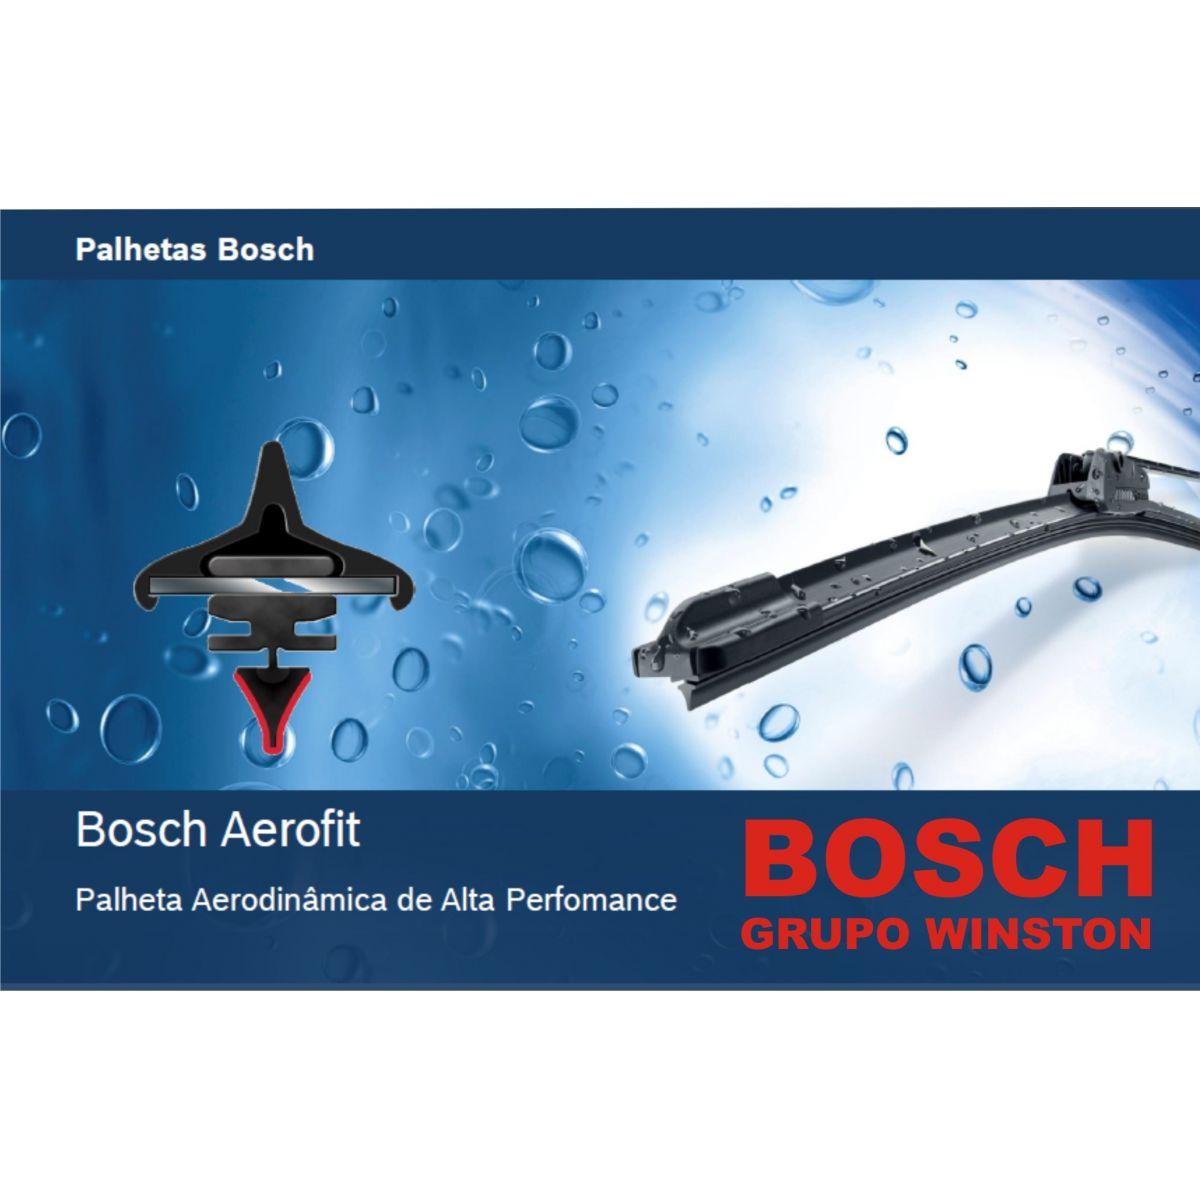 Palheta Bosch Aerofit Limpador de para brisa Bosch VW Caravelle Eurovan New Beetle Passat Variant